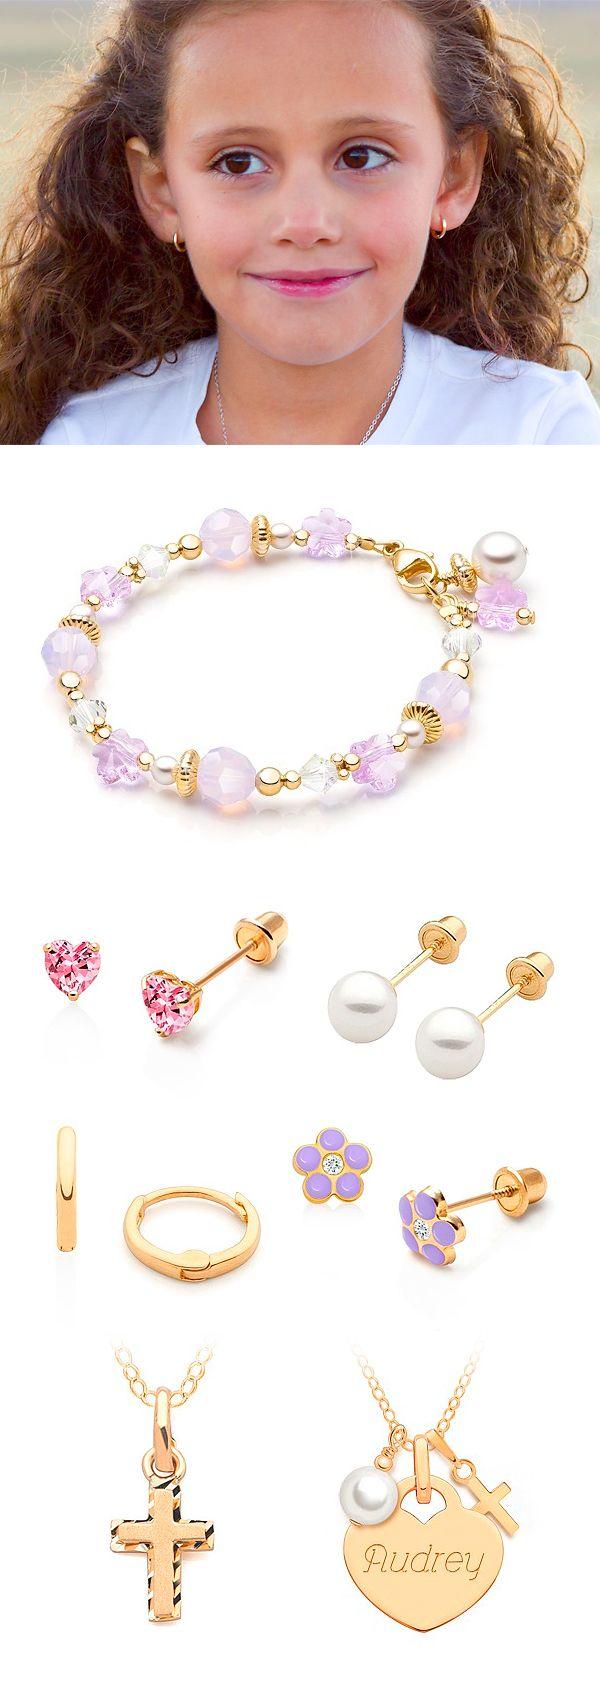 Baby u childrenus jewelry gifts ideas i paparazzi lady pinterest